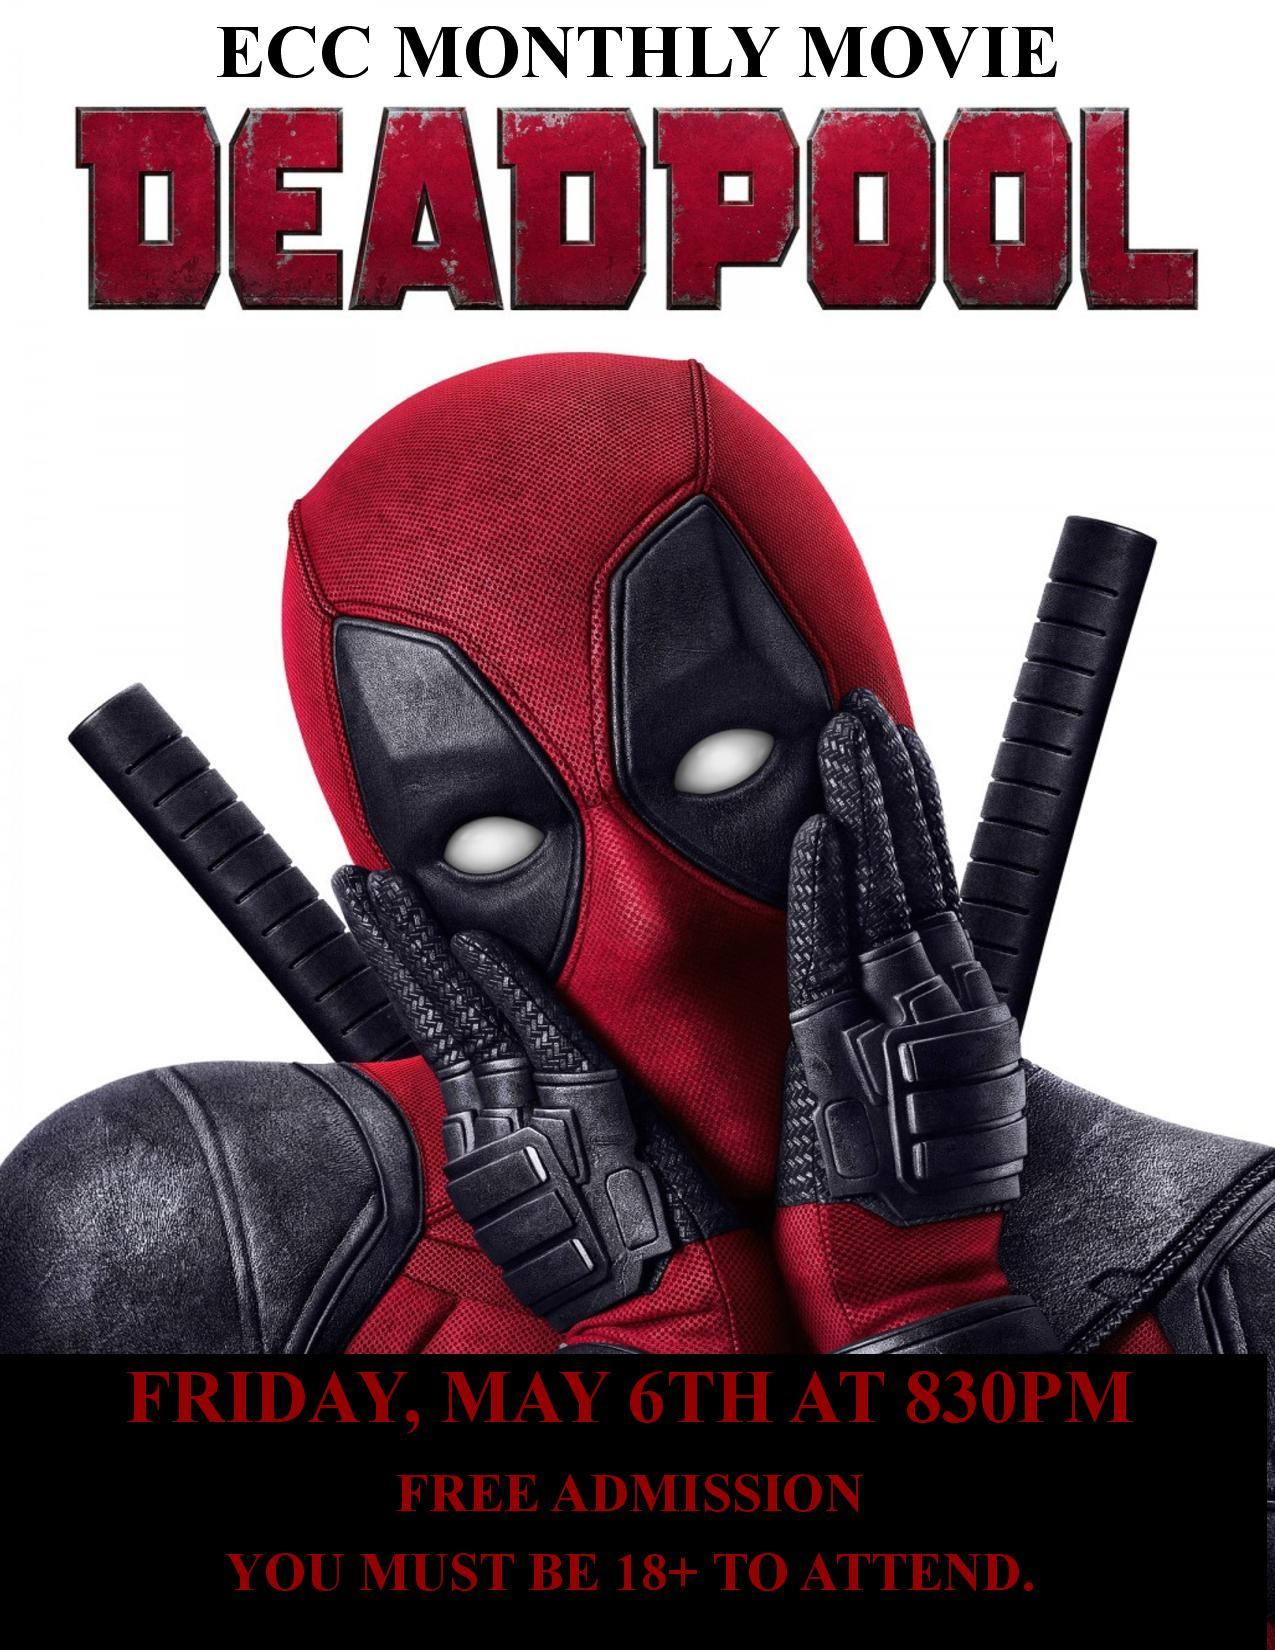 May Movie-Deadpool-page-001.jpg